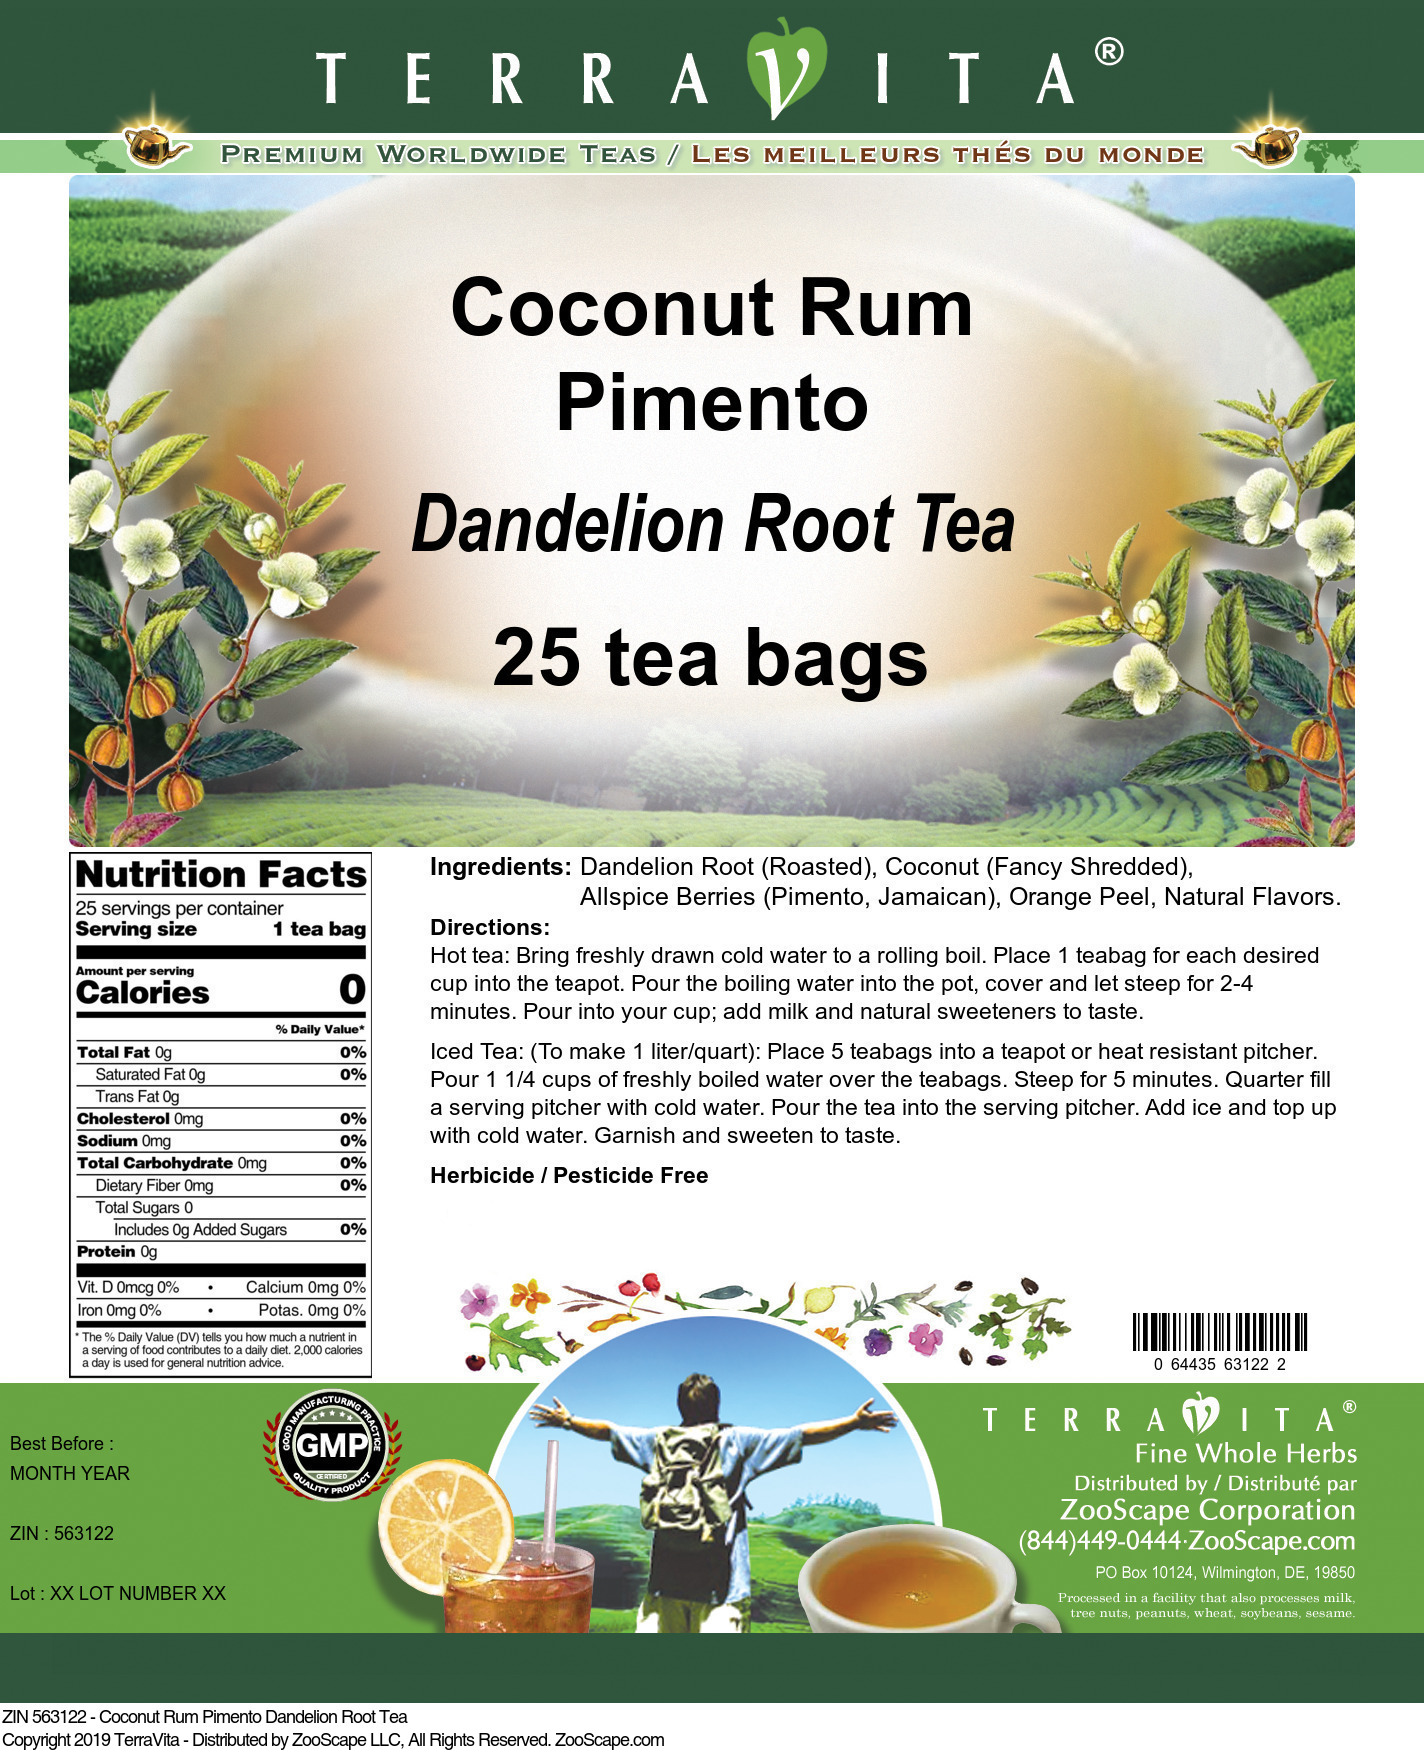 Coconut Rum Pimento Dandelion Root Tea